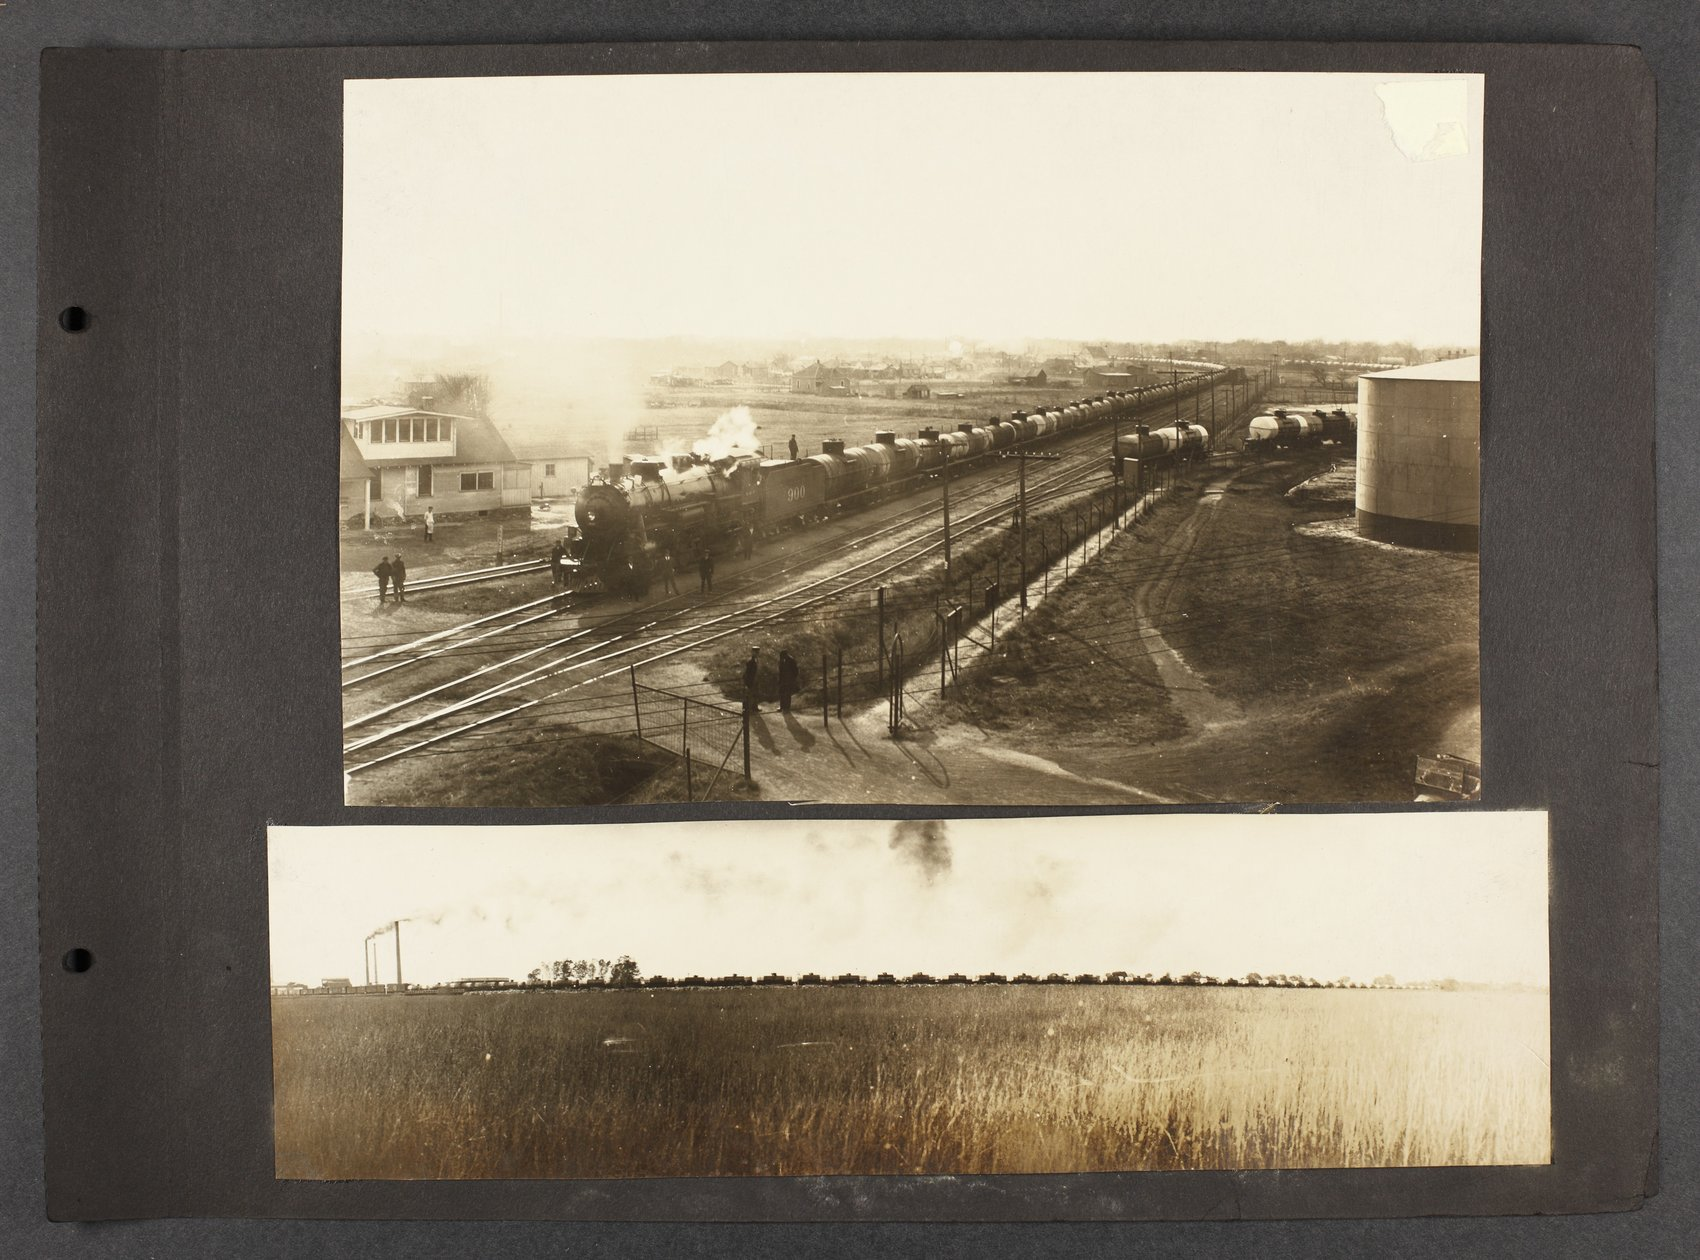 National Refining Company, Coffeyville, Kansas - 4